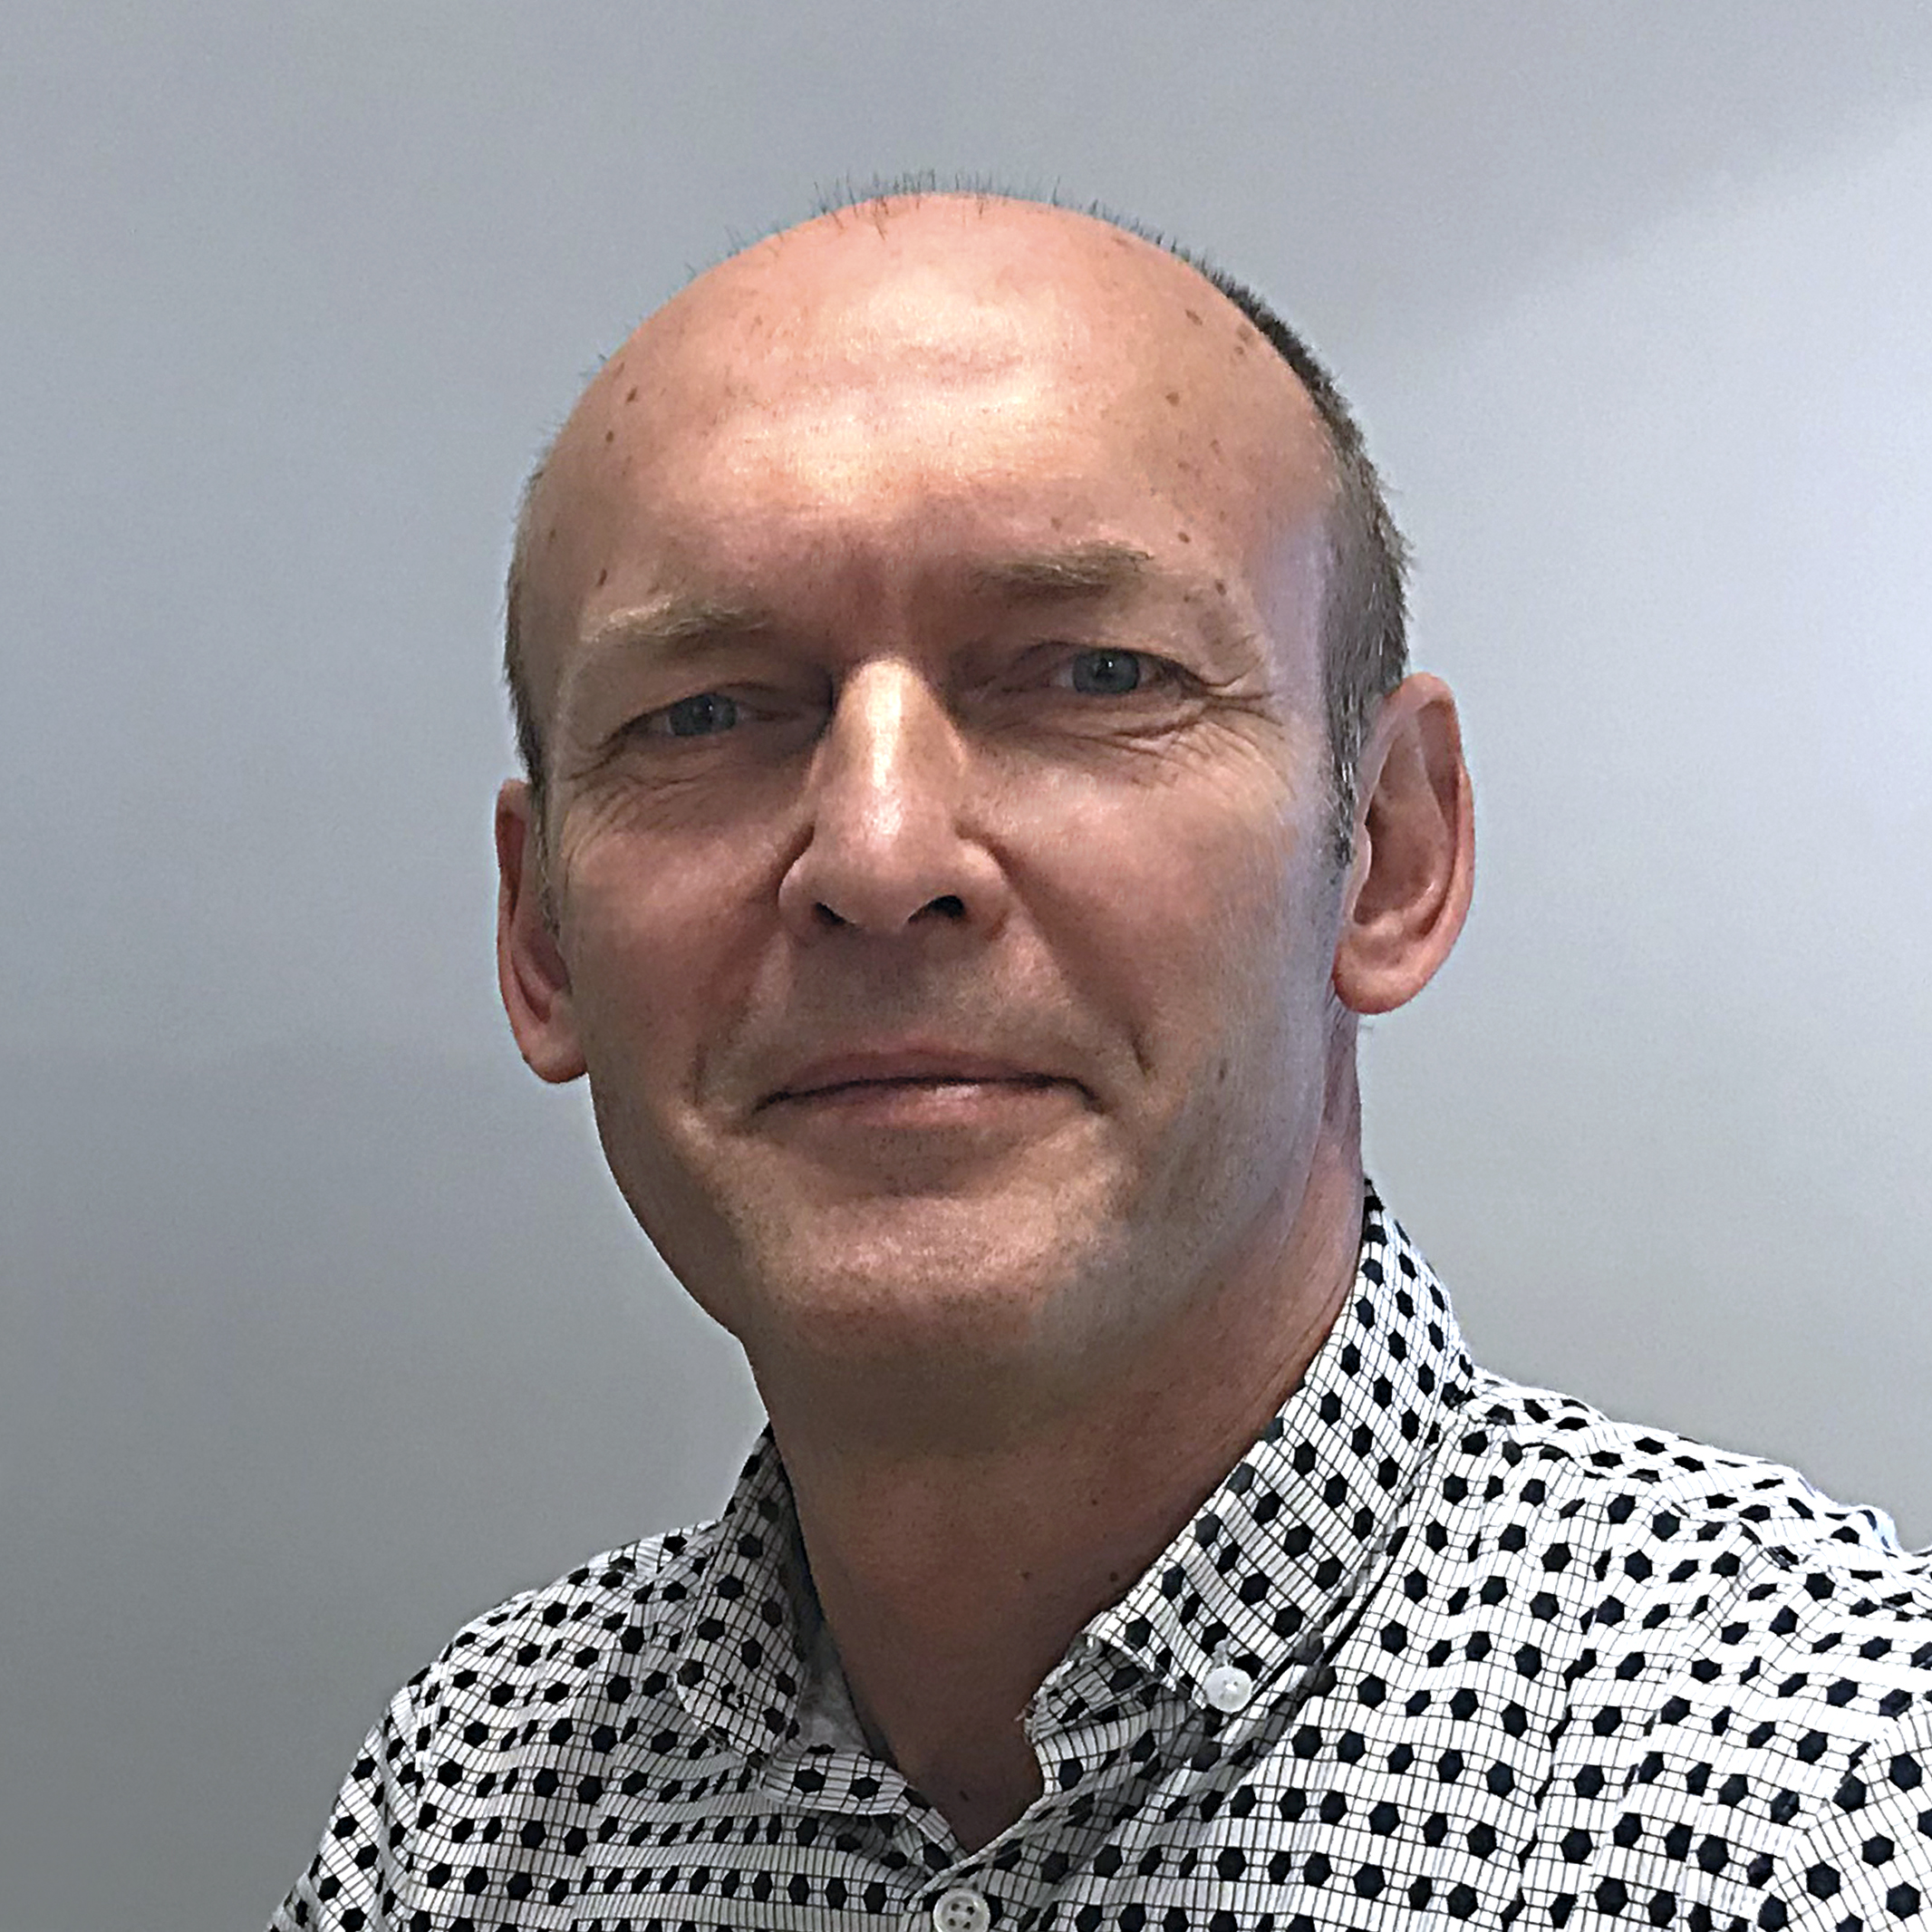 Michael Søndergård Rasmussen